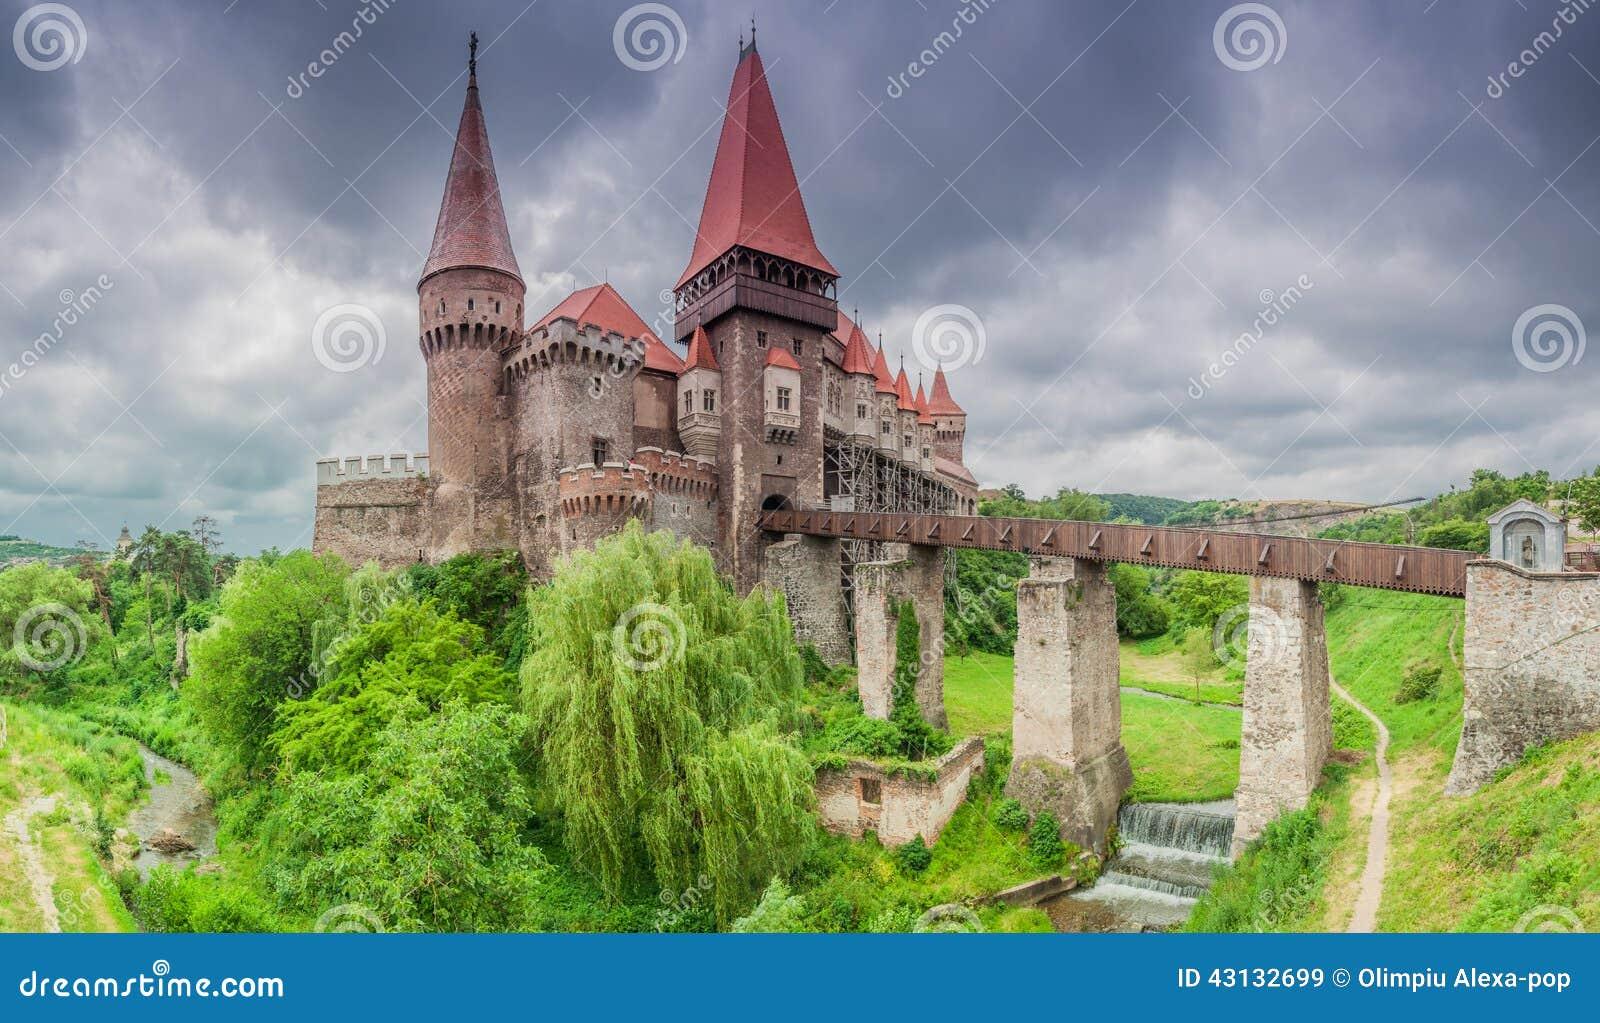 Corvins Castle, Ρουμανία